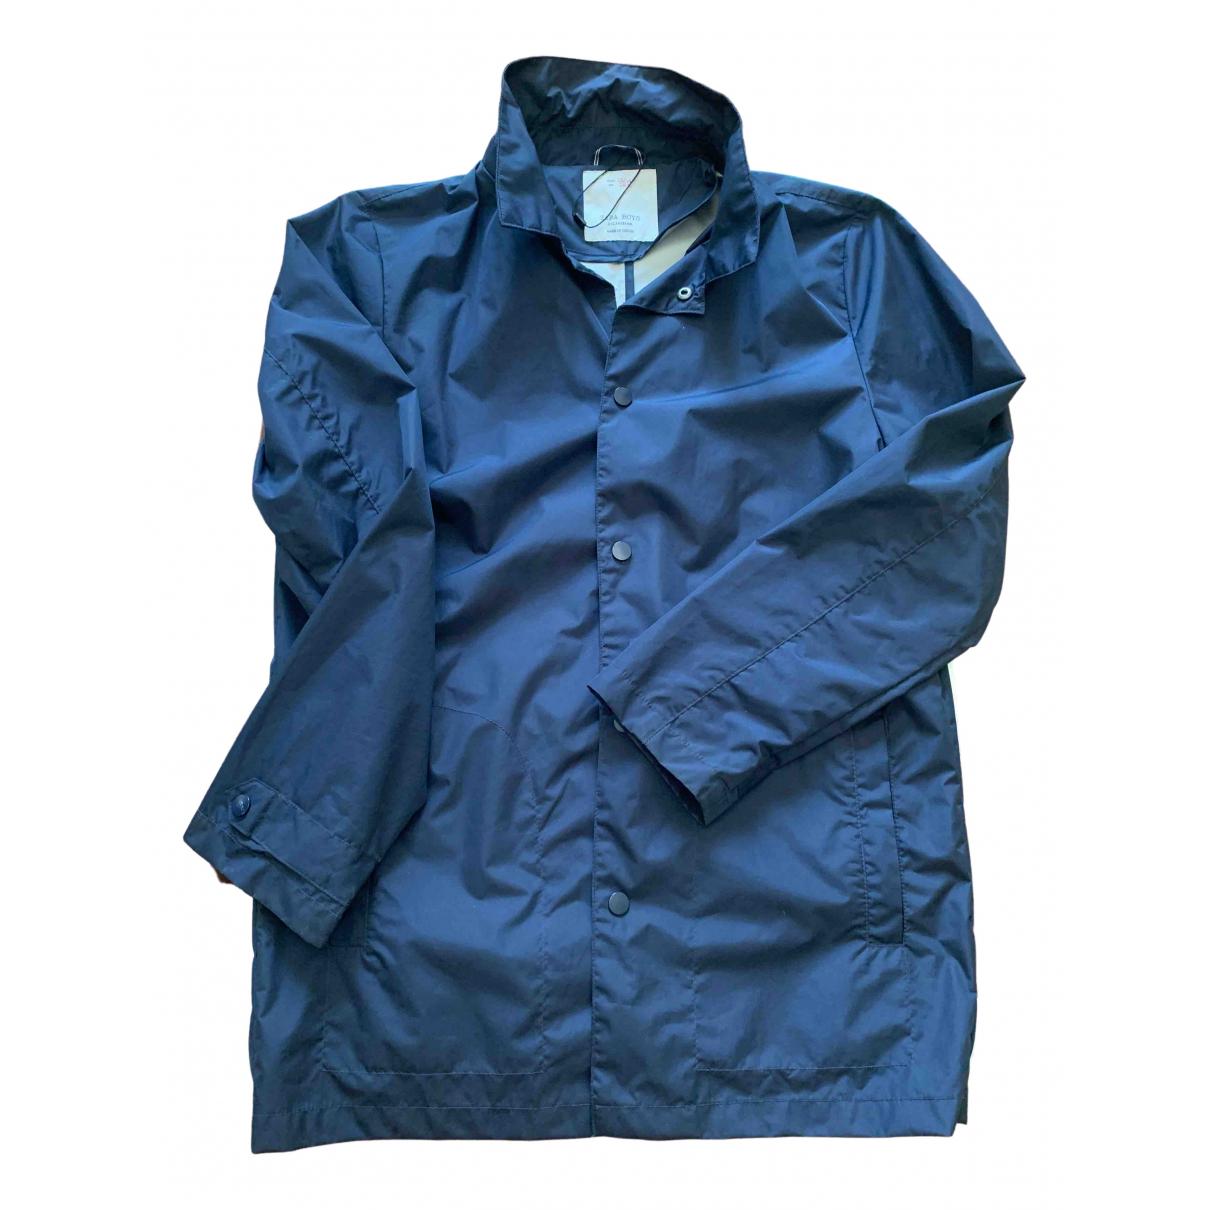 Zara \N Jacke, Maentel in  Blau Polyester